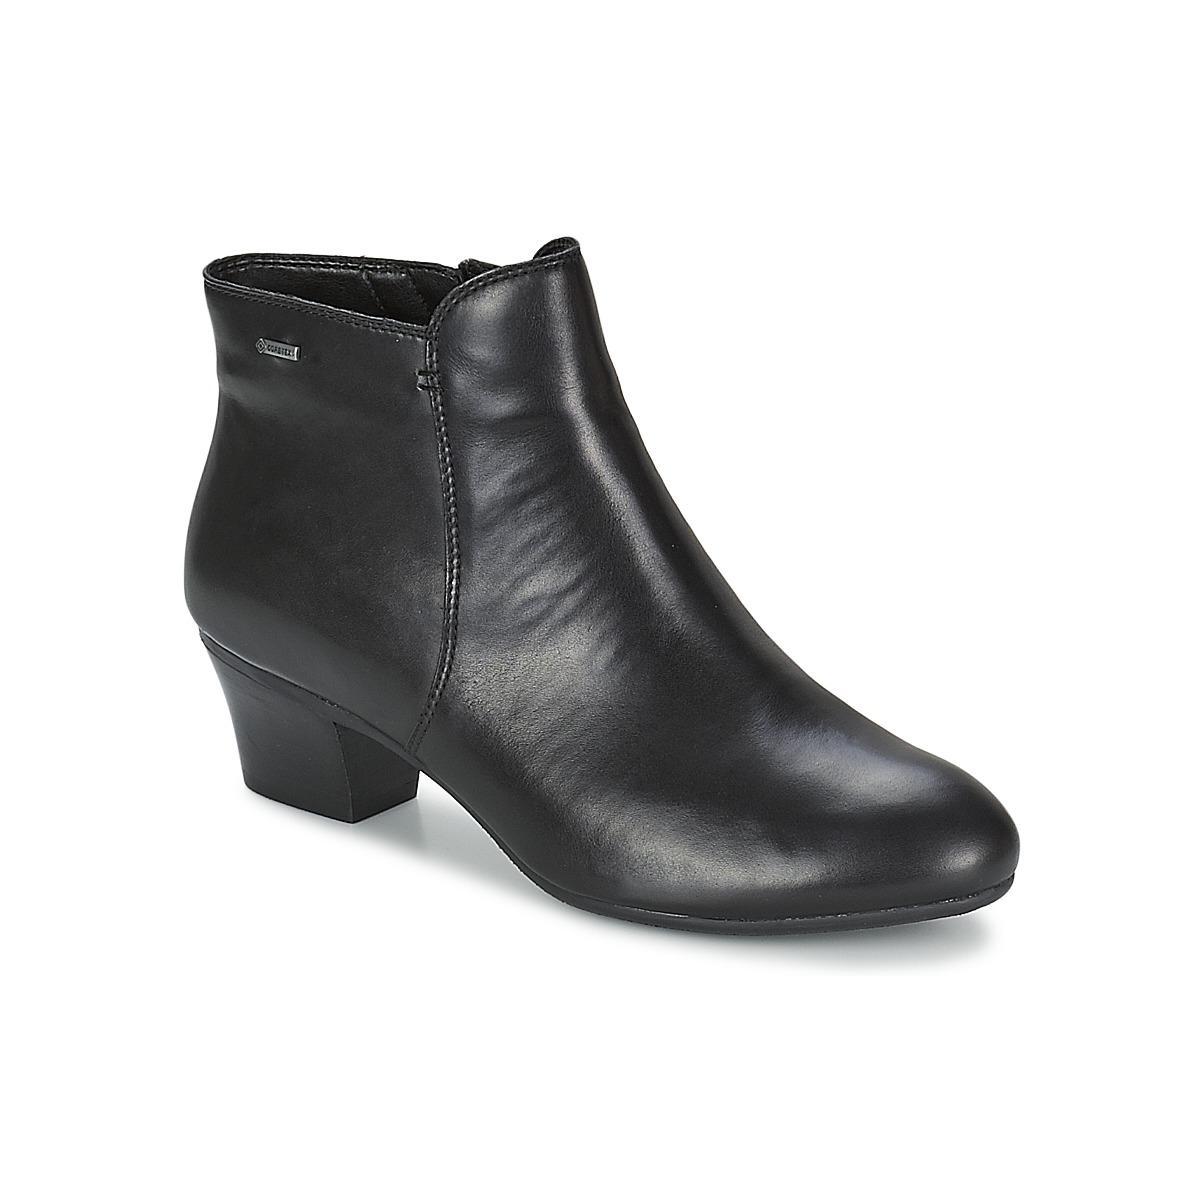 Clarks MELANIE SU GTX women's Low Boots in Outlet Largest Supplier Factory Outlet Sale Online Best Seller For Sale bX4Jl